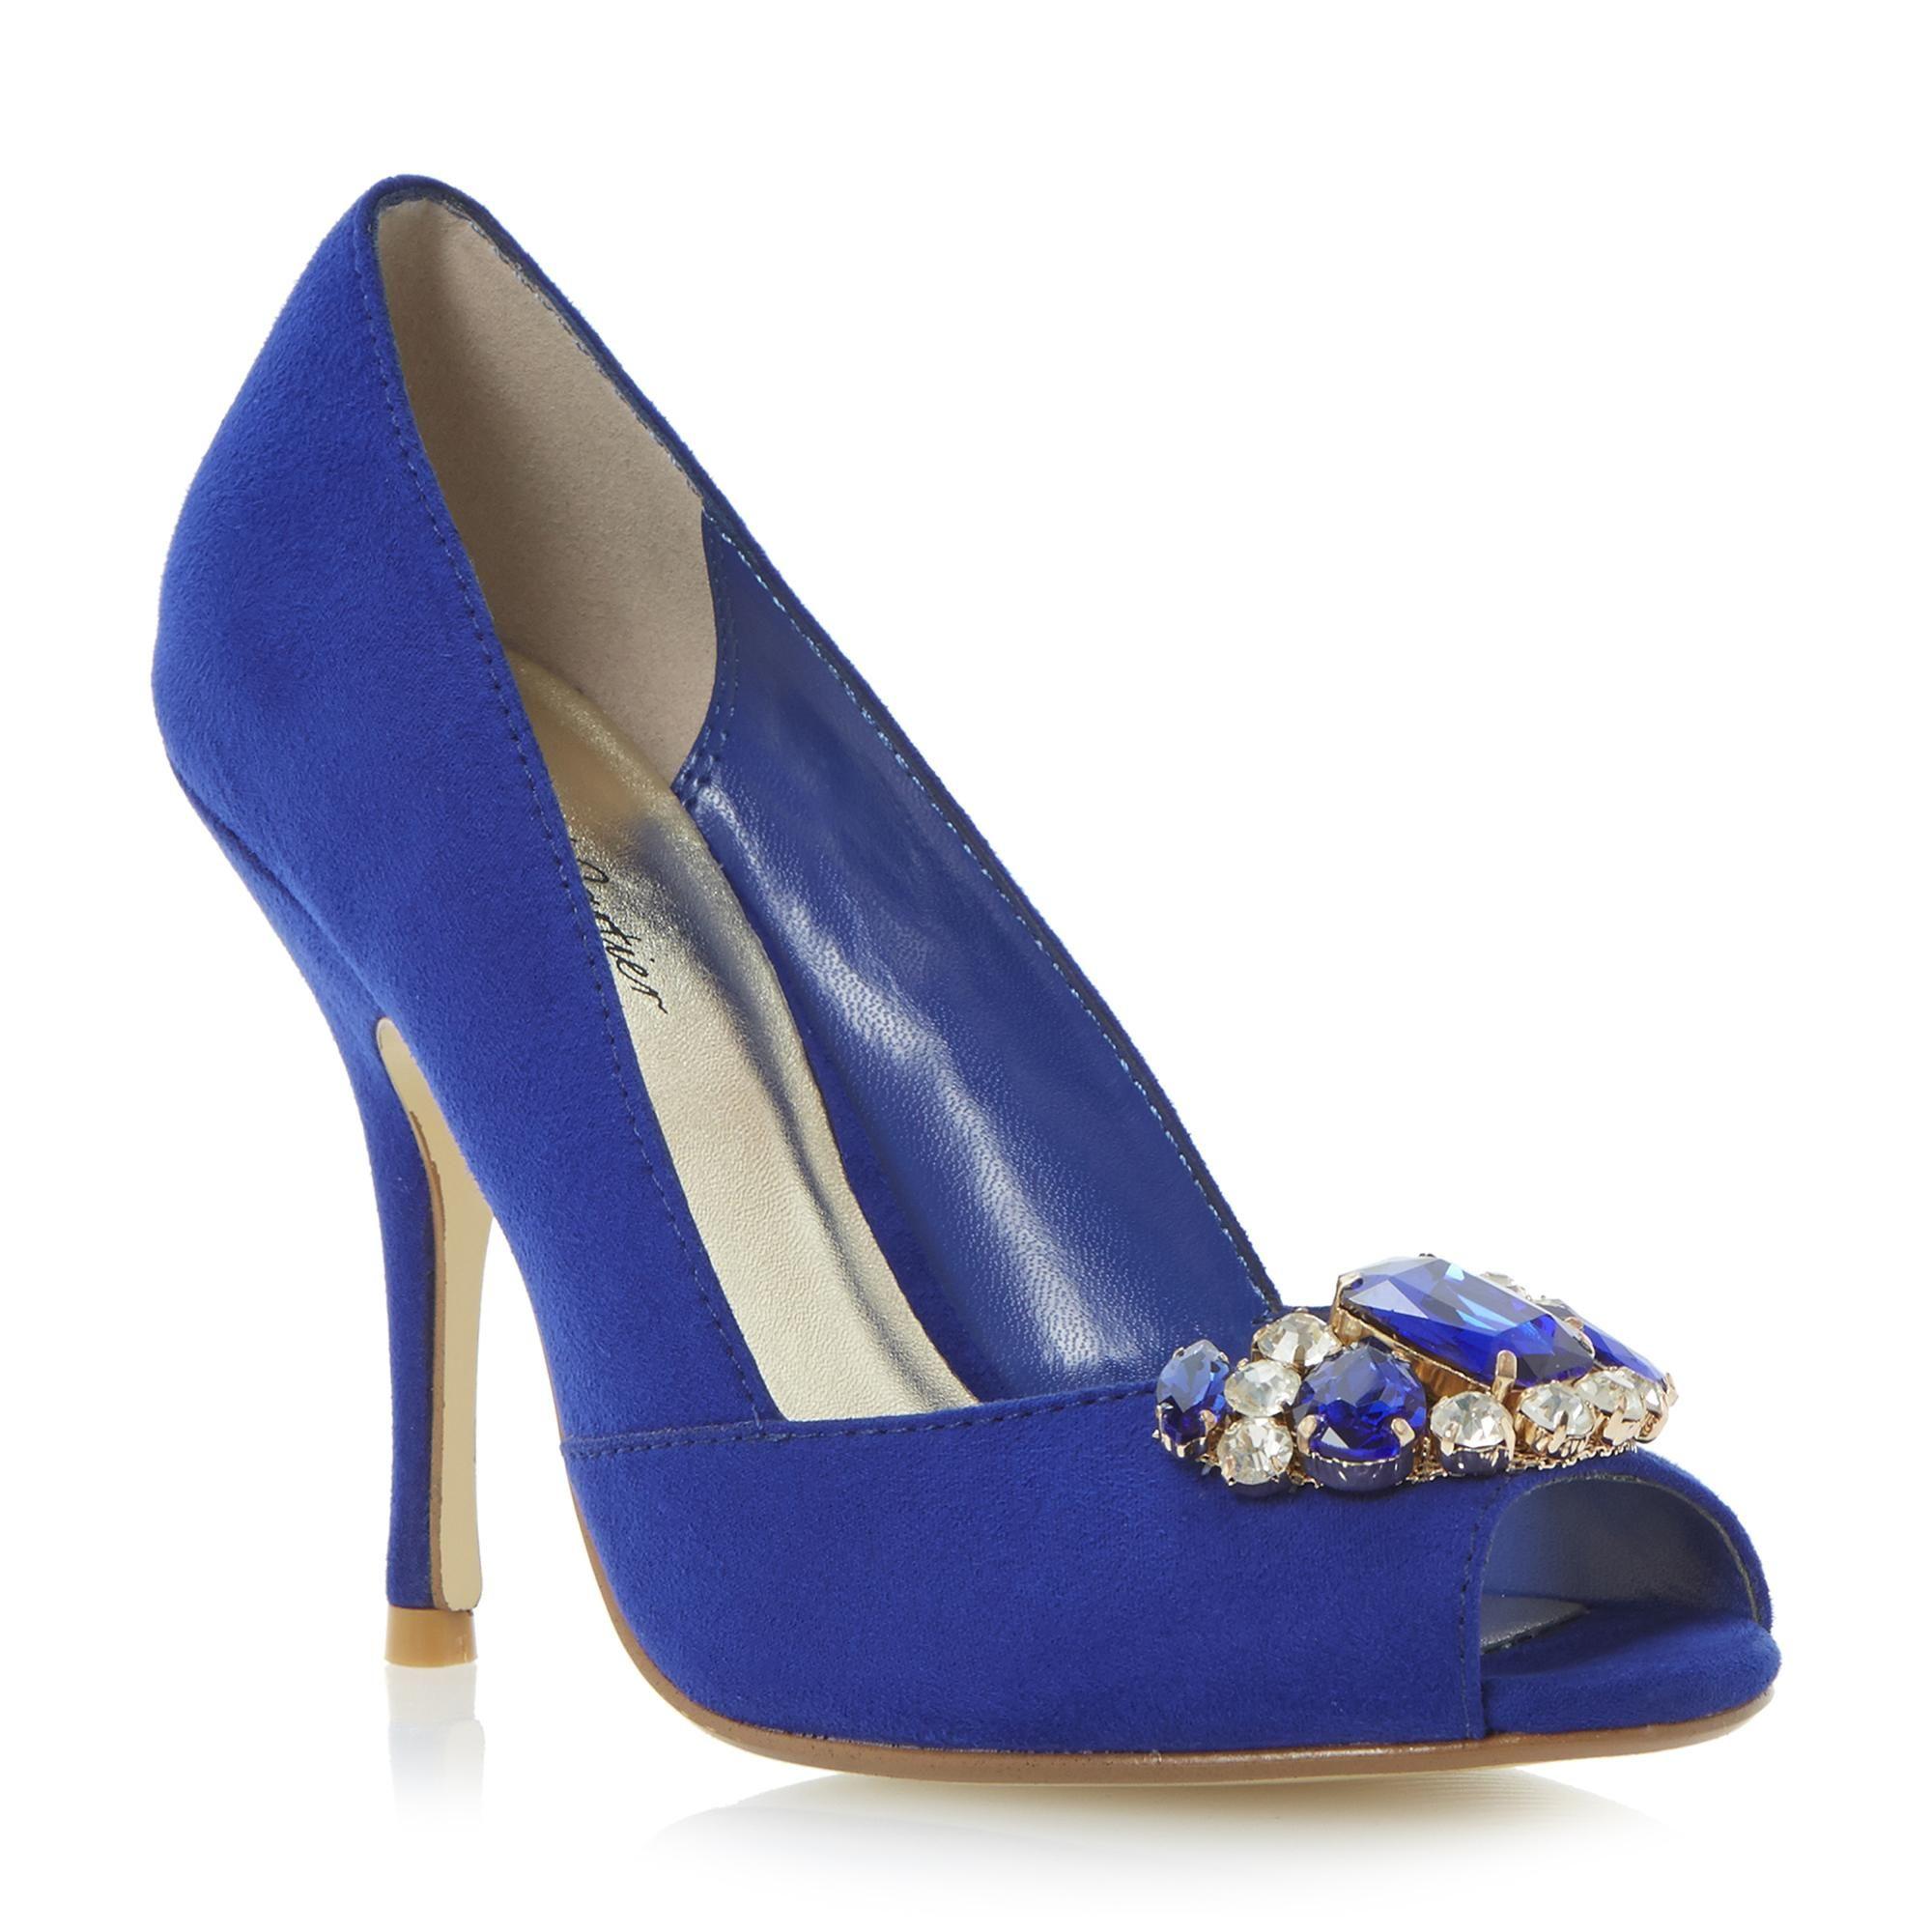 Roland Cartier Ladies DEANA - Embellished Peep Toe Court Shoe - blue | Dune  Shoes Online